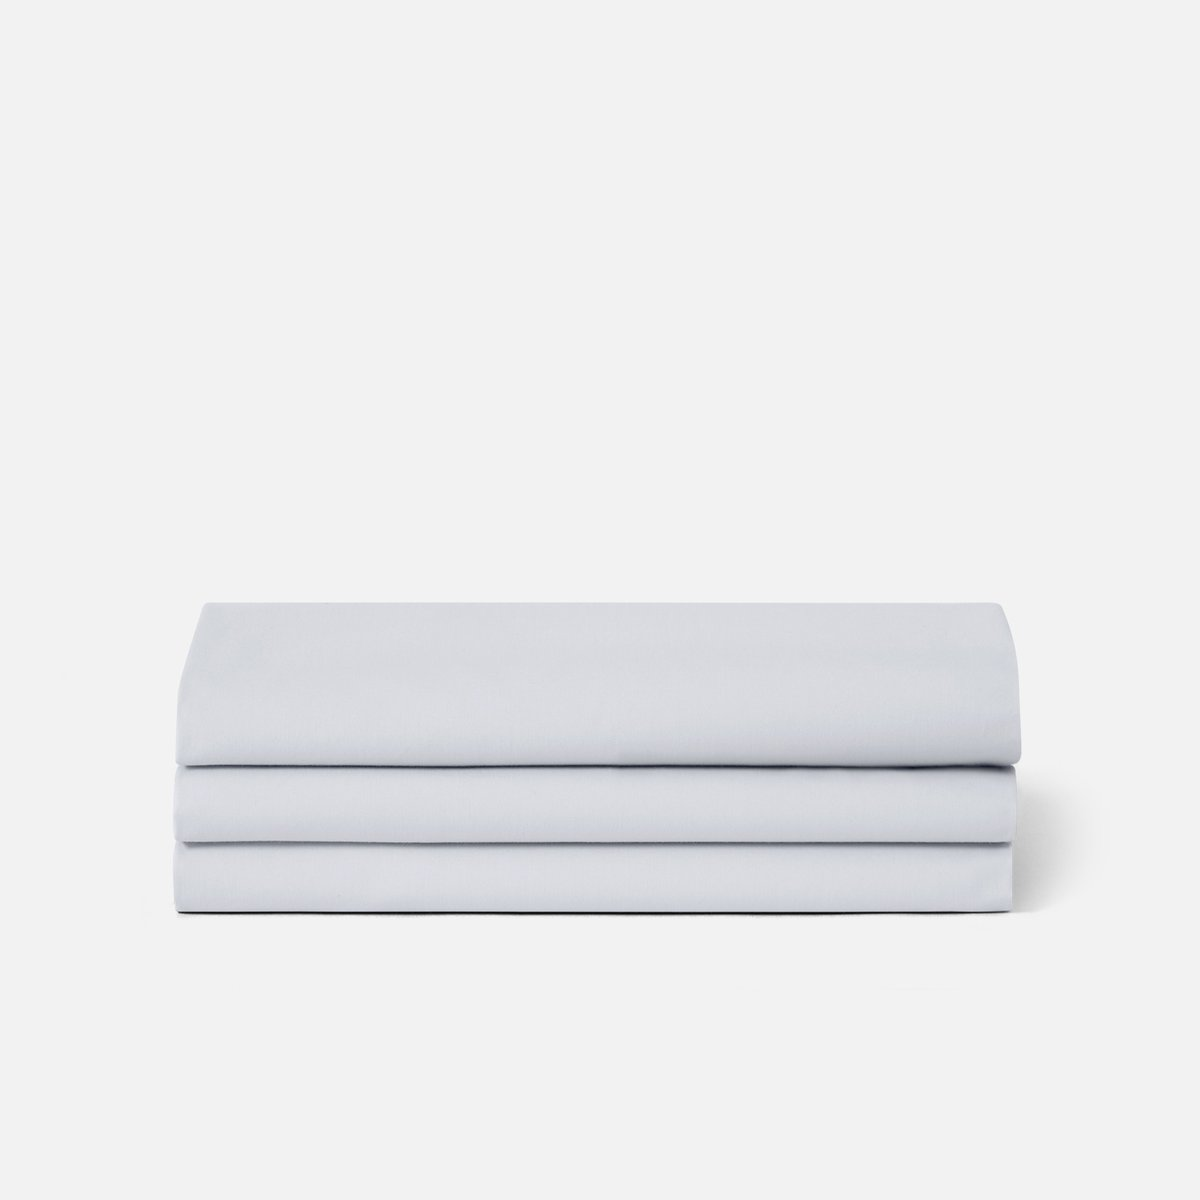 love language gift ideas brooklinen luxe sheets